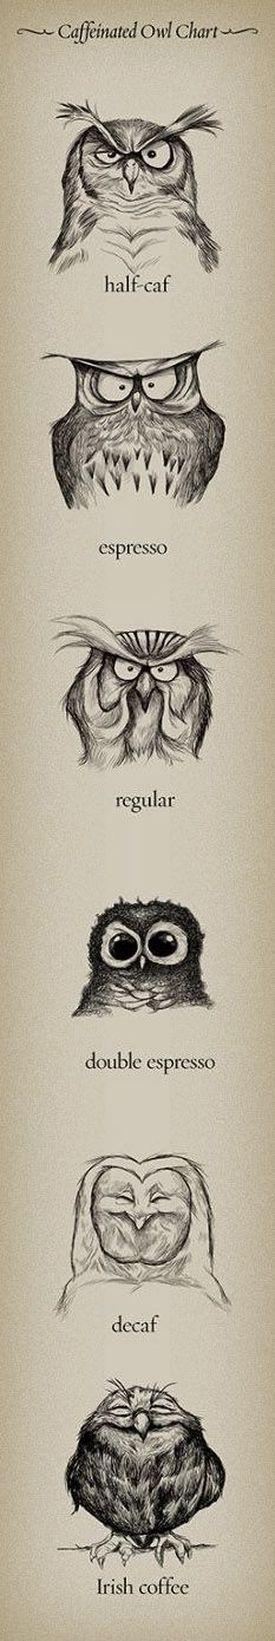 Caffeinated Owl Grafico